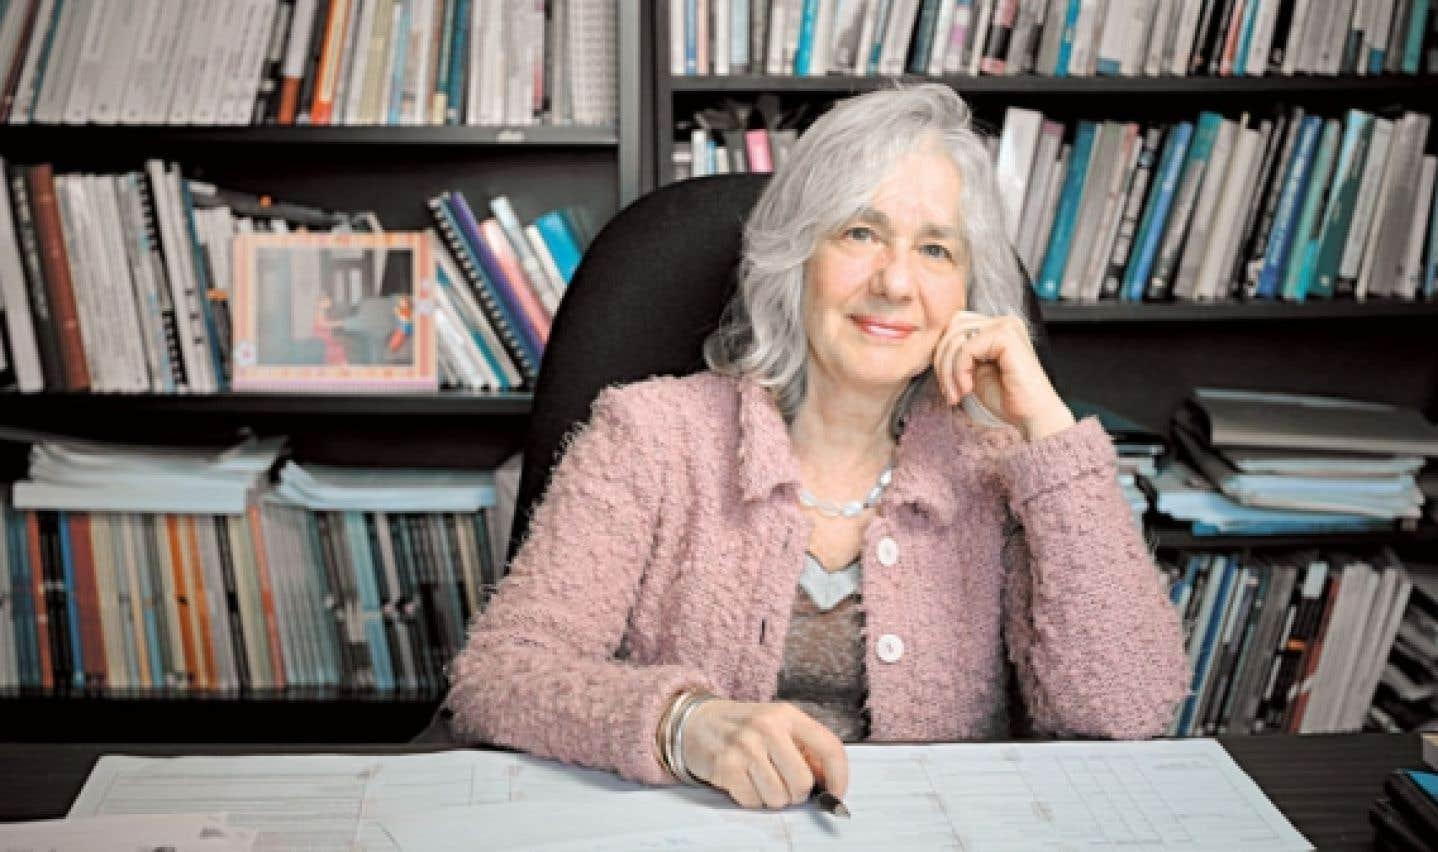 Marguerite Mendell diririge l'Institut Karl-Polanyi depuis plus de 20 ans.